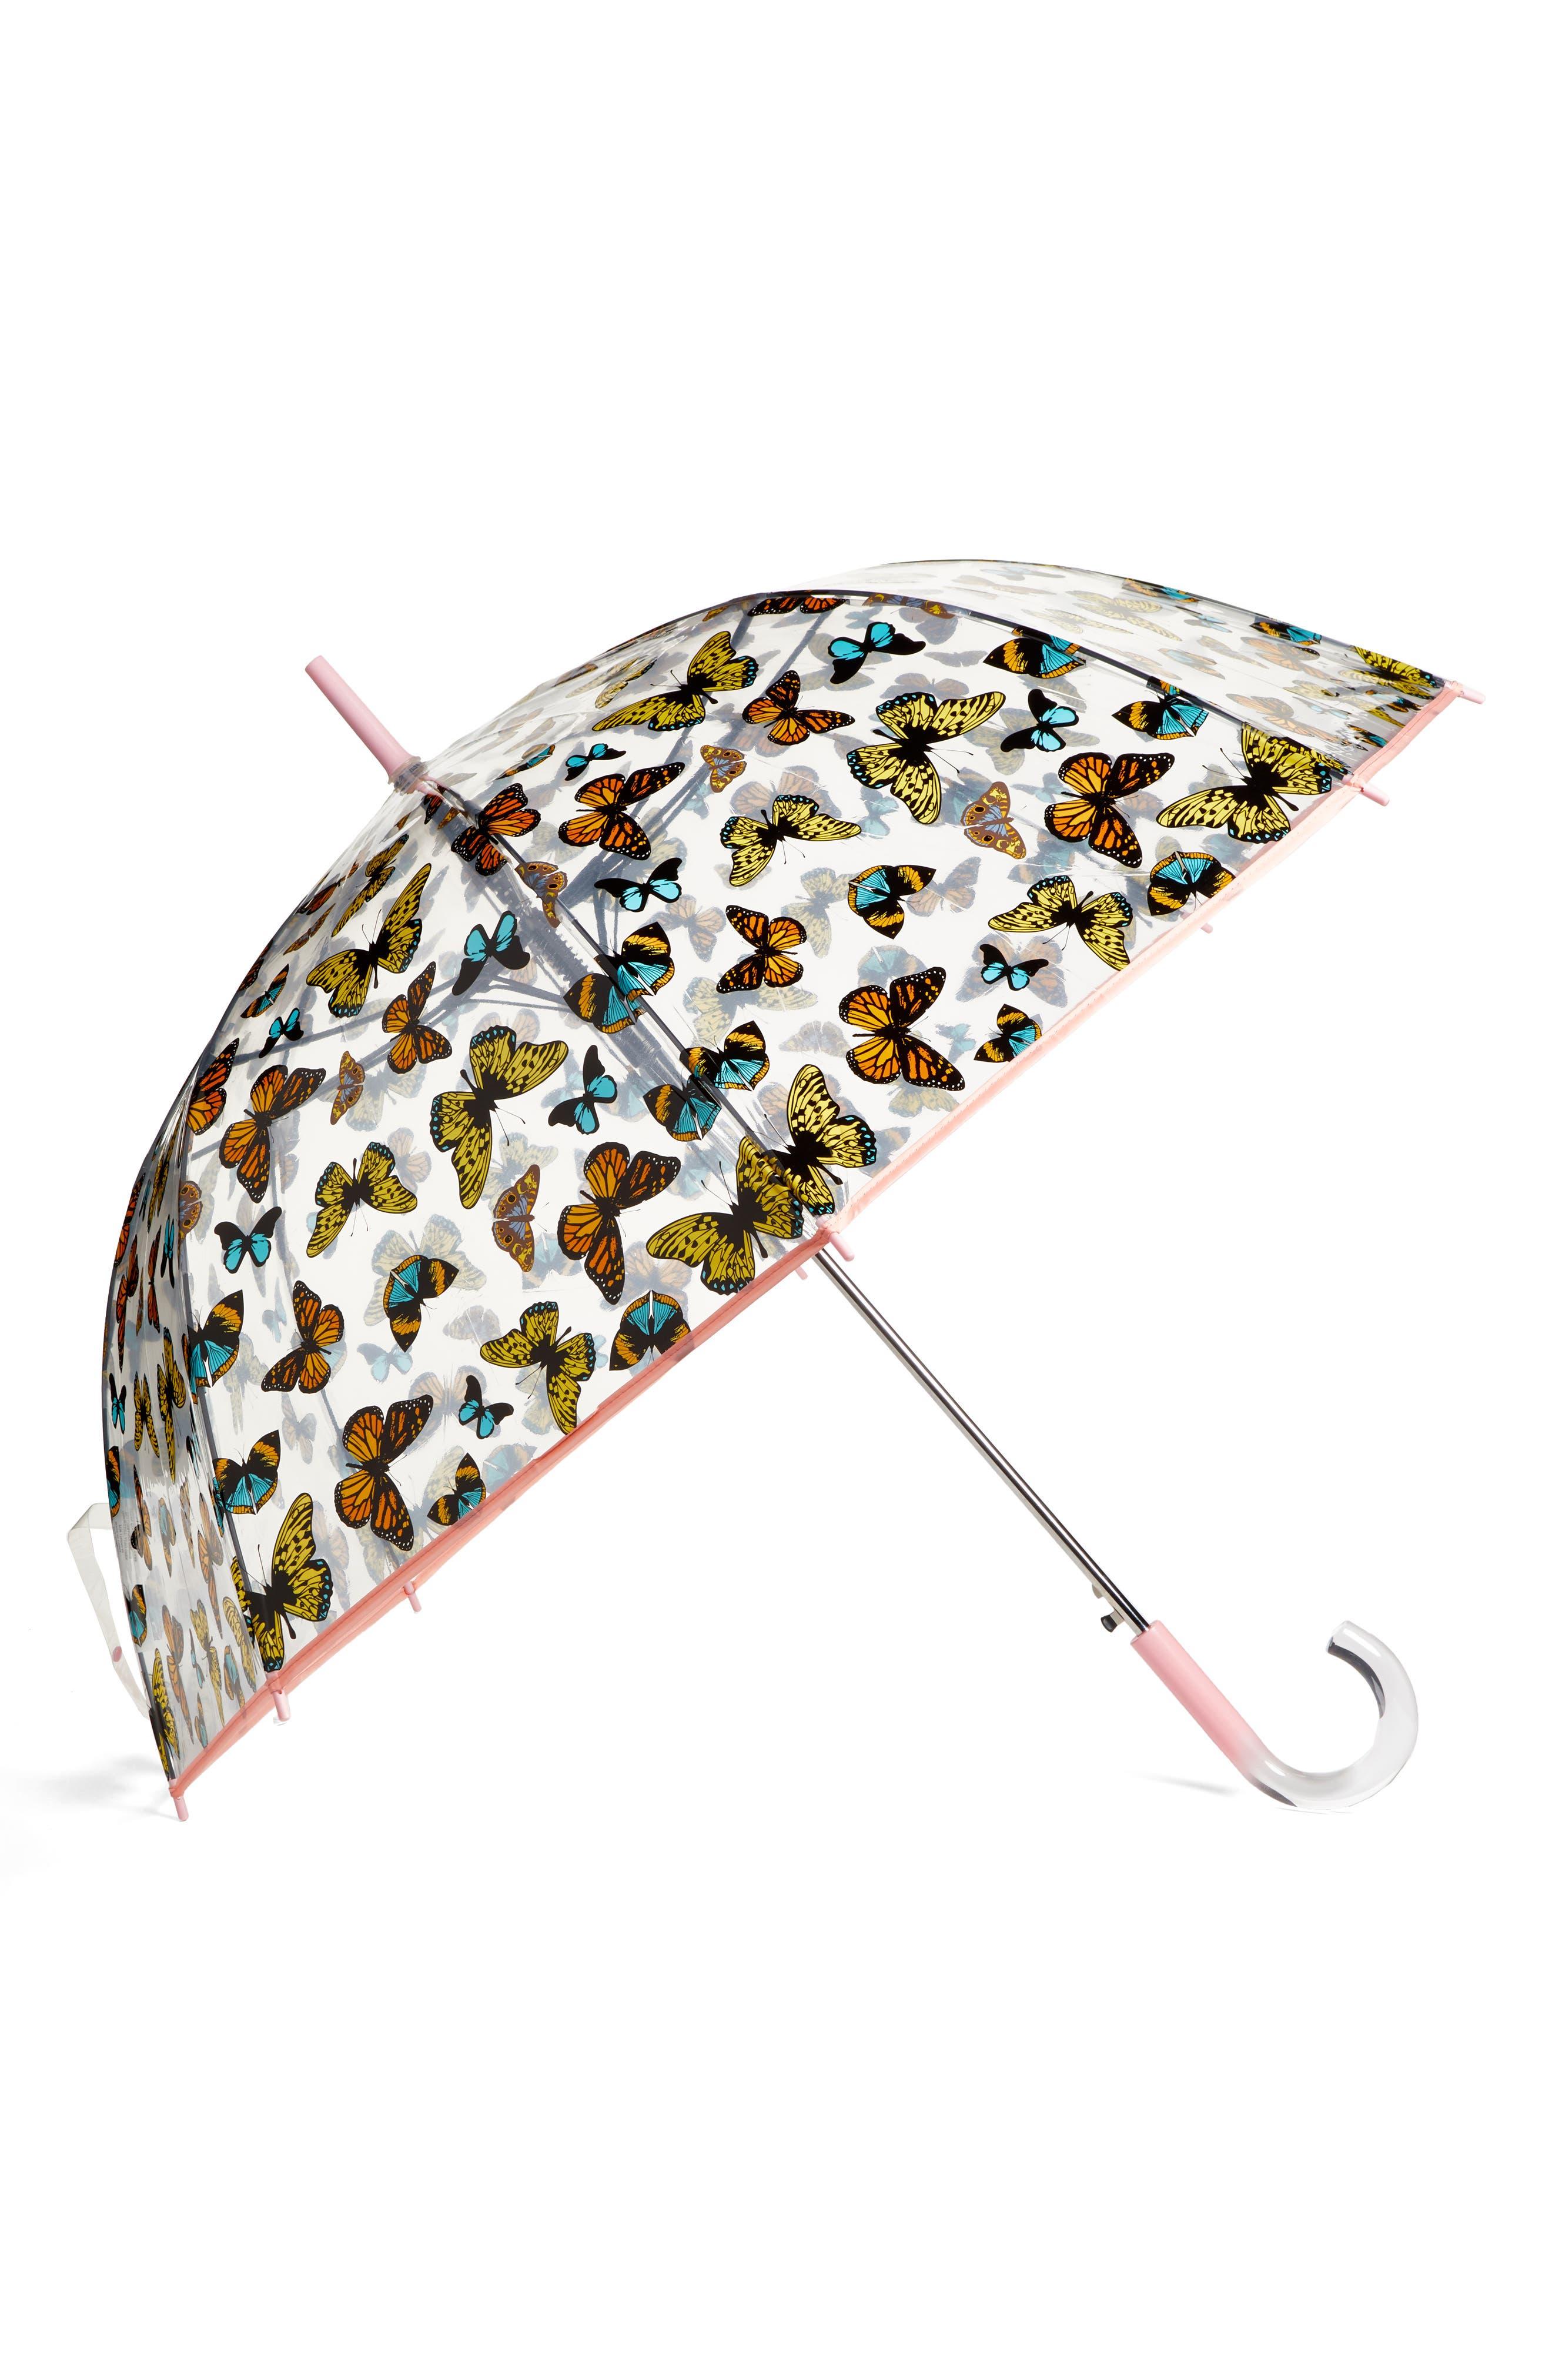 'The Bubble' Auto Open Stick Umbrella,                         Main,                         color, Nord Butterfly